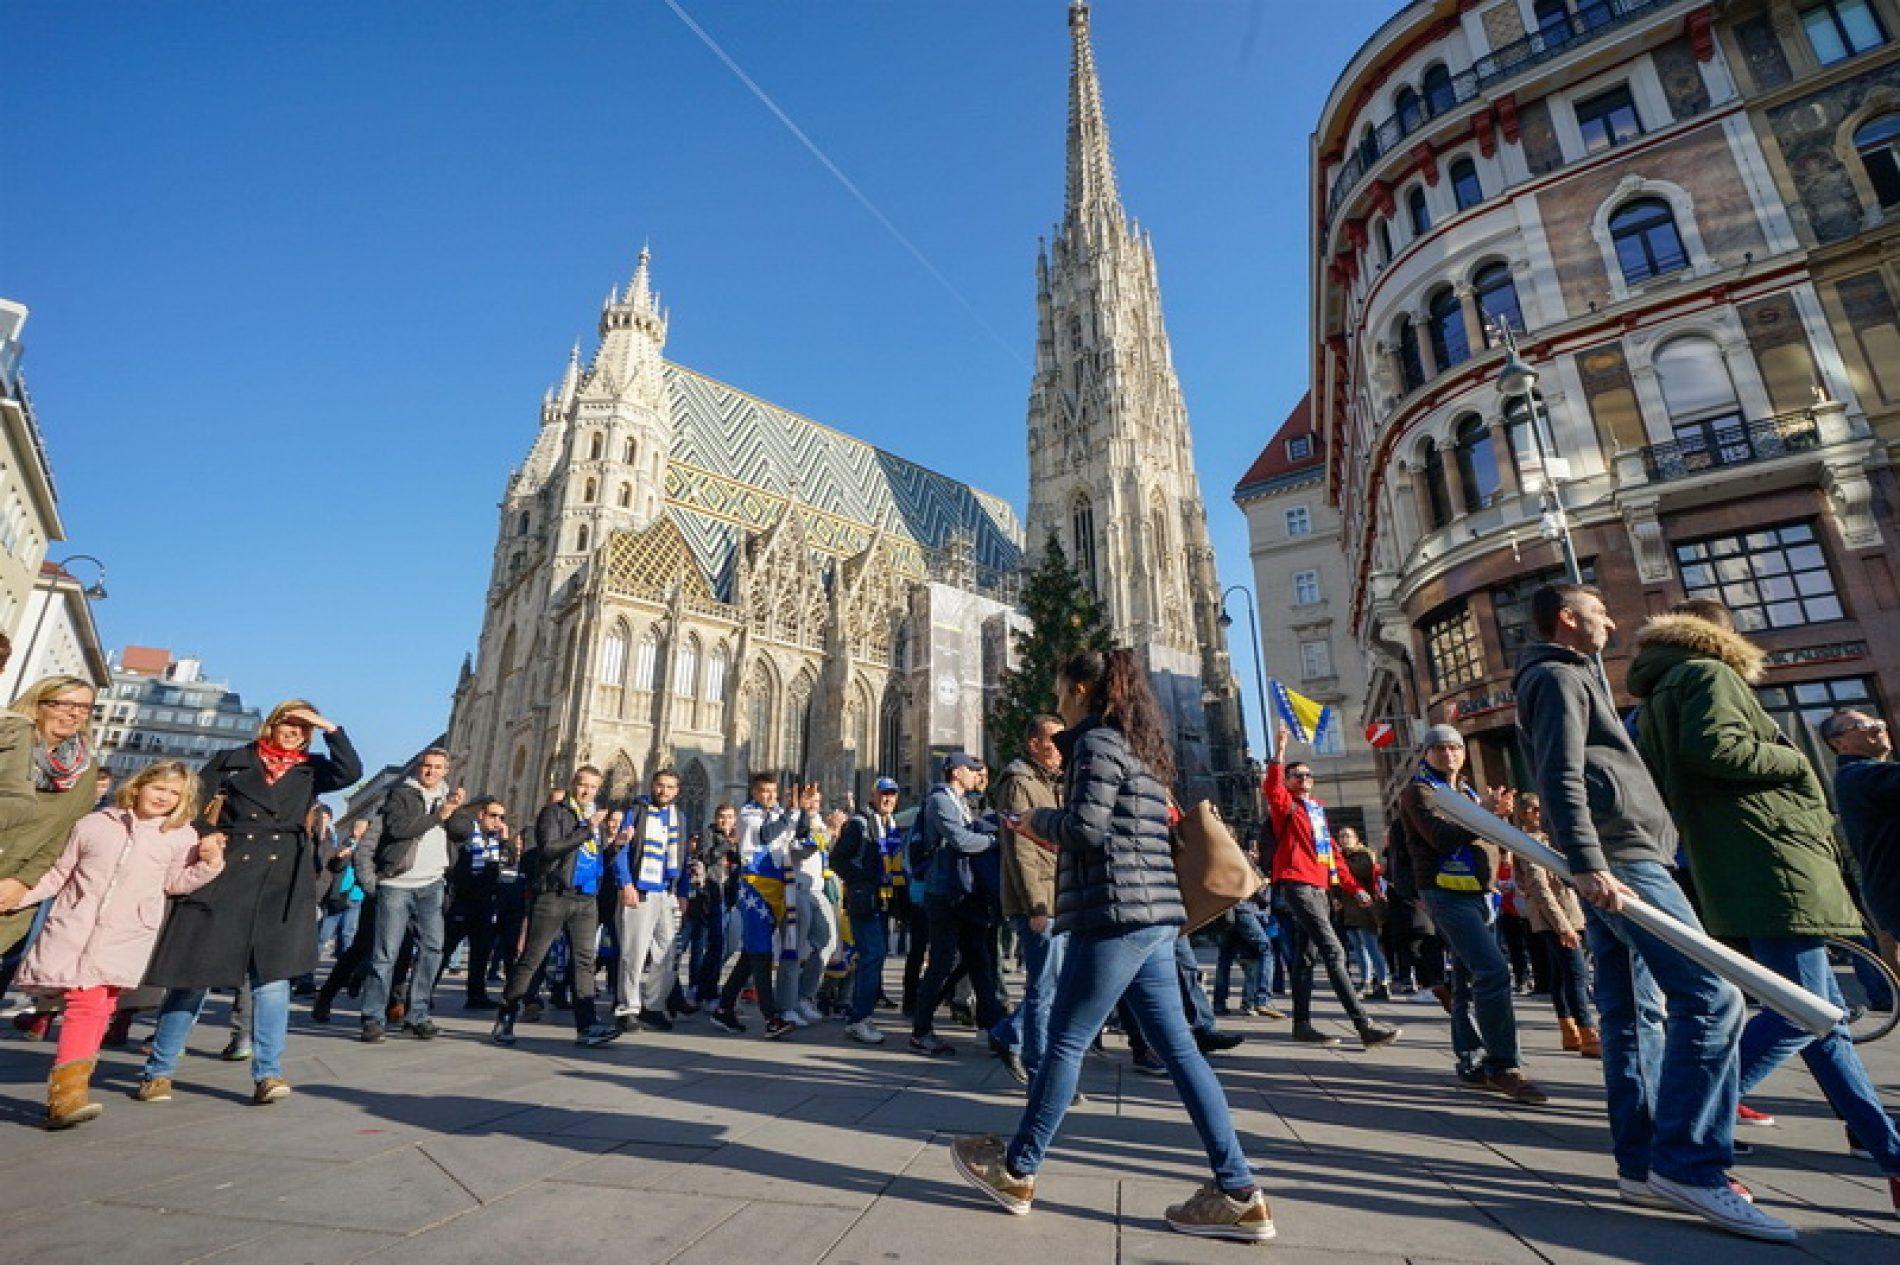 Formira se komitet podrške za priznanje bosanske manjine u Austriji